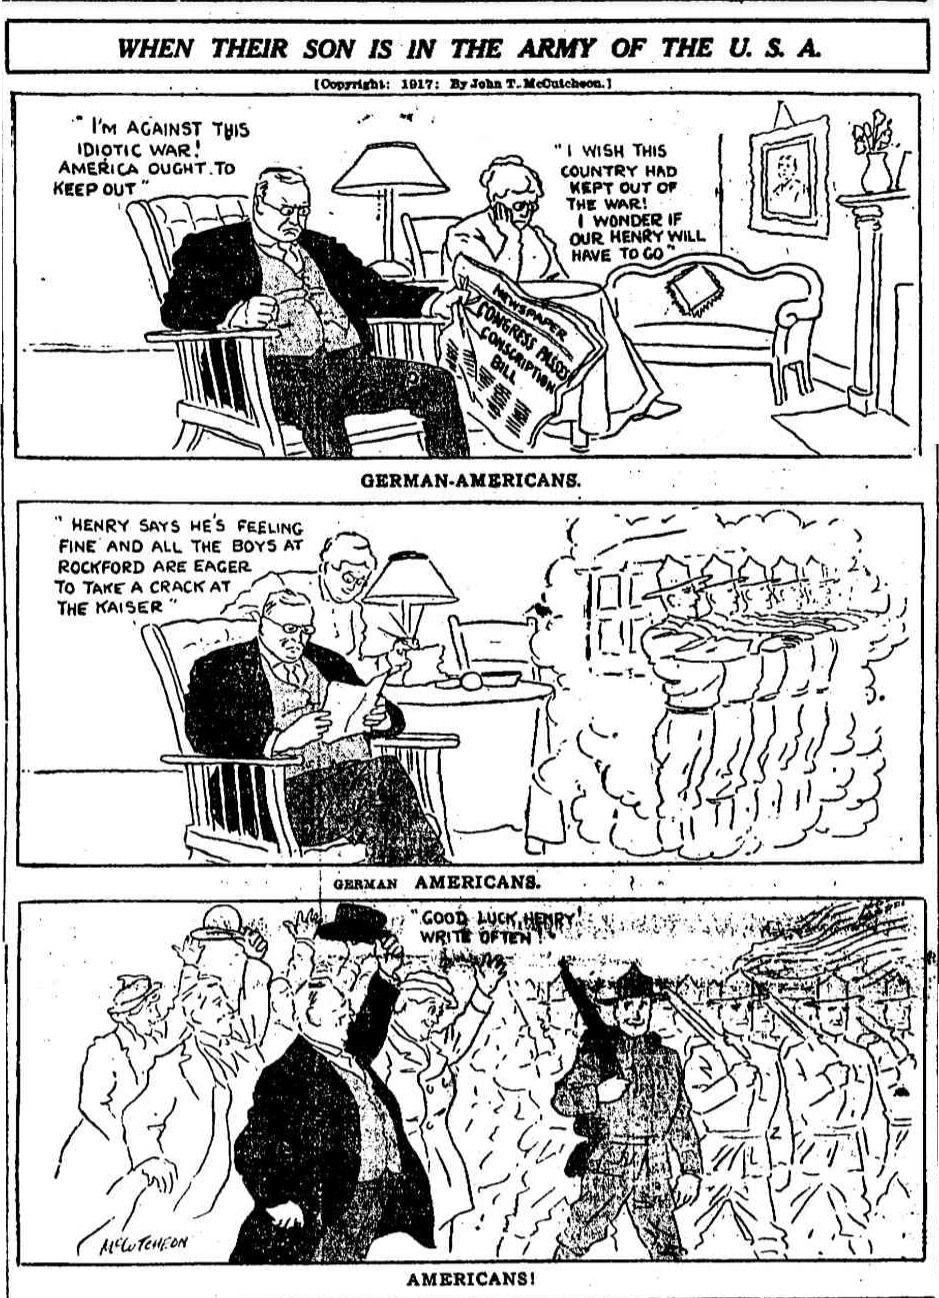 Sep 19 1917 When Their Son Is In The Army Of The U S A Chicago